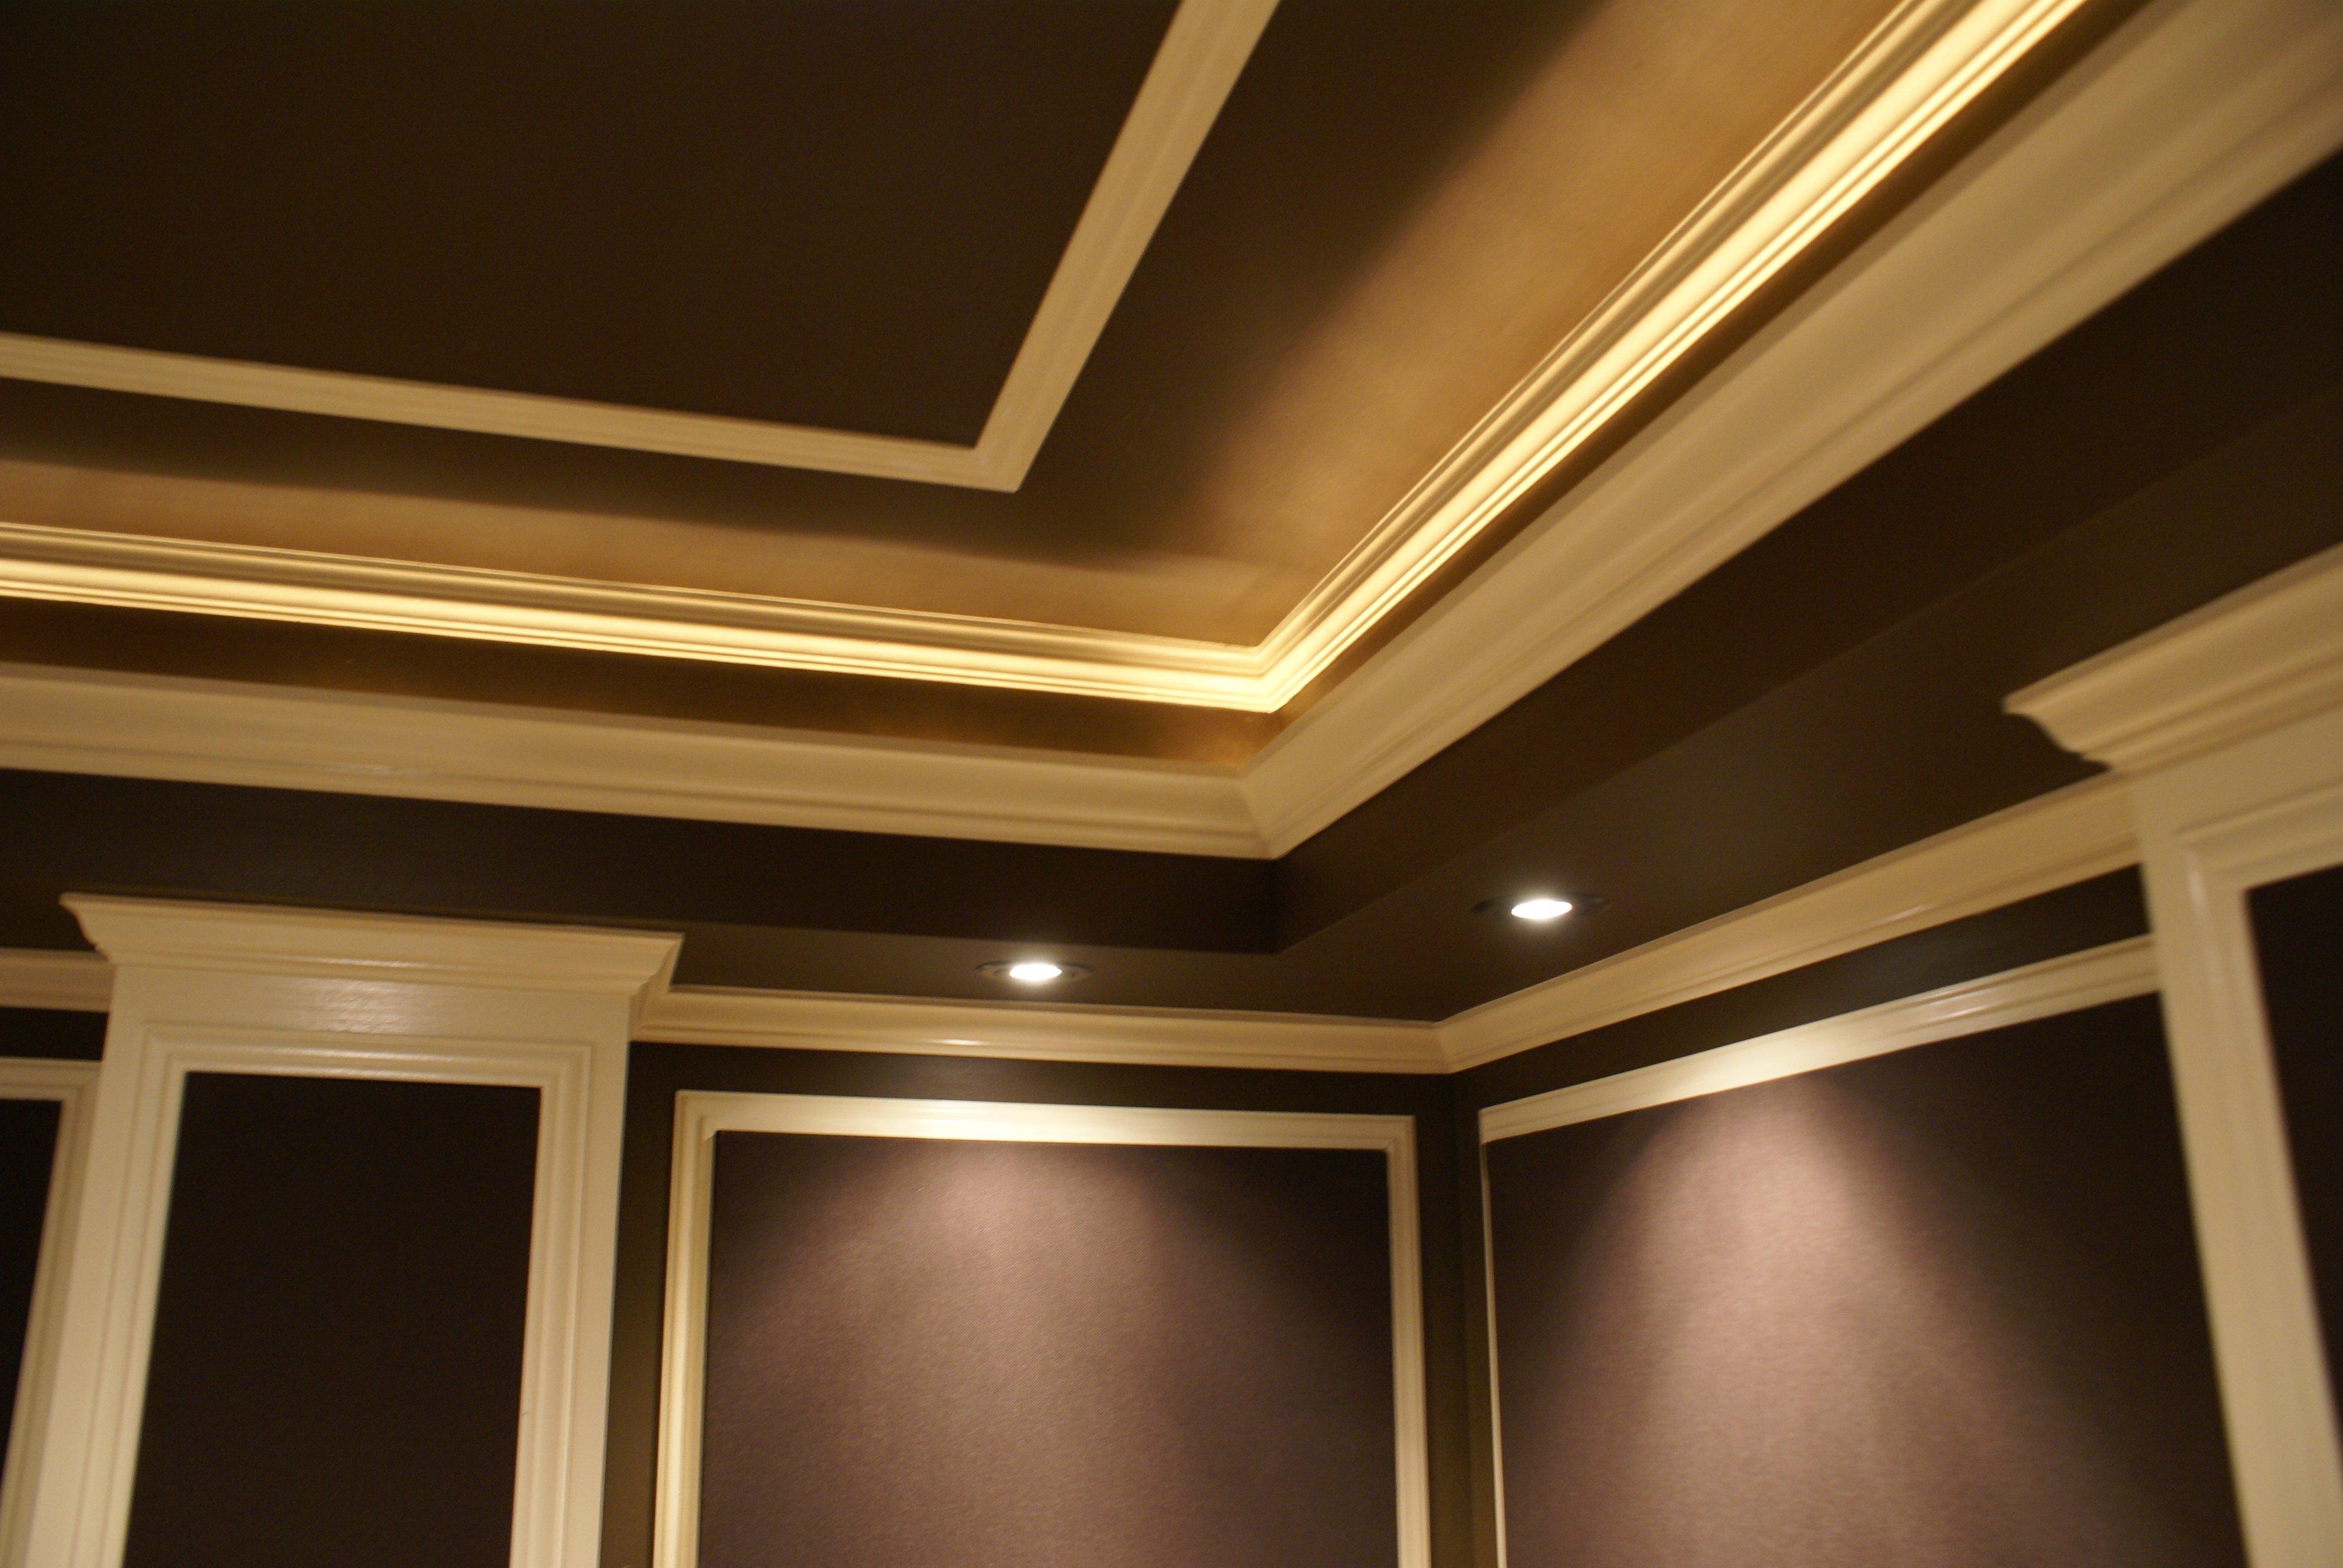 how important dark ceiling avs forum home theater discussions rh avsforum com